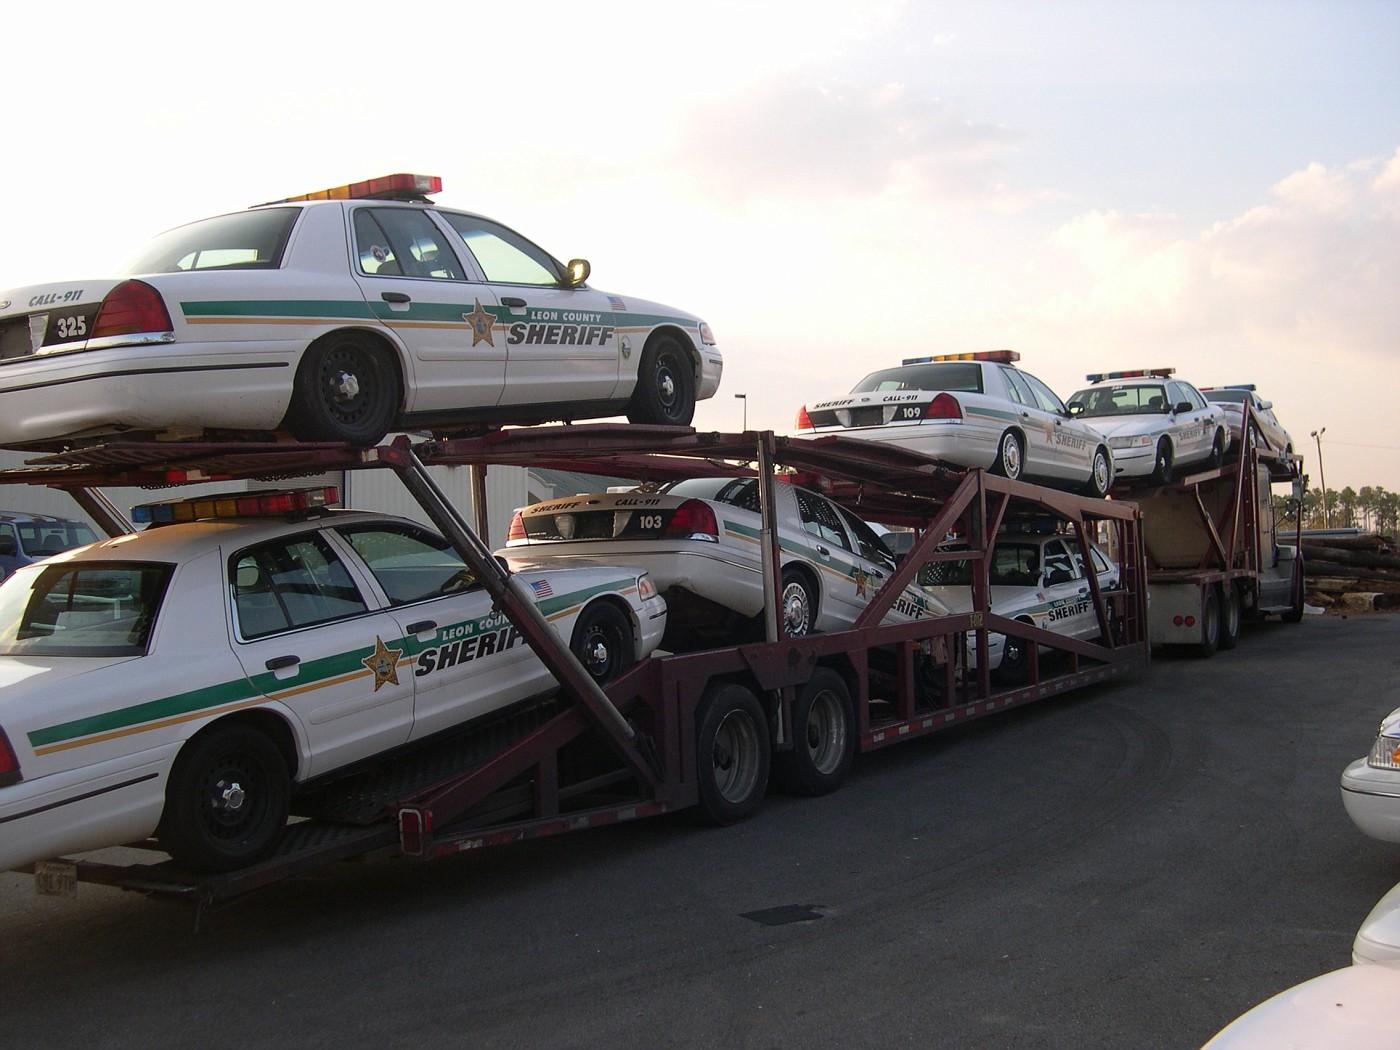 Leon County, FL, Sheriff units